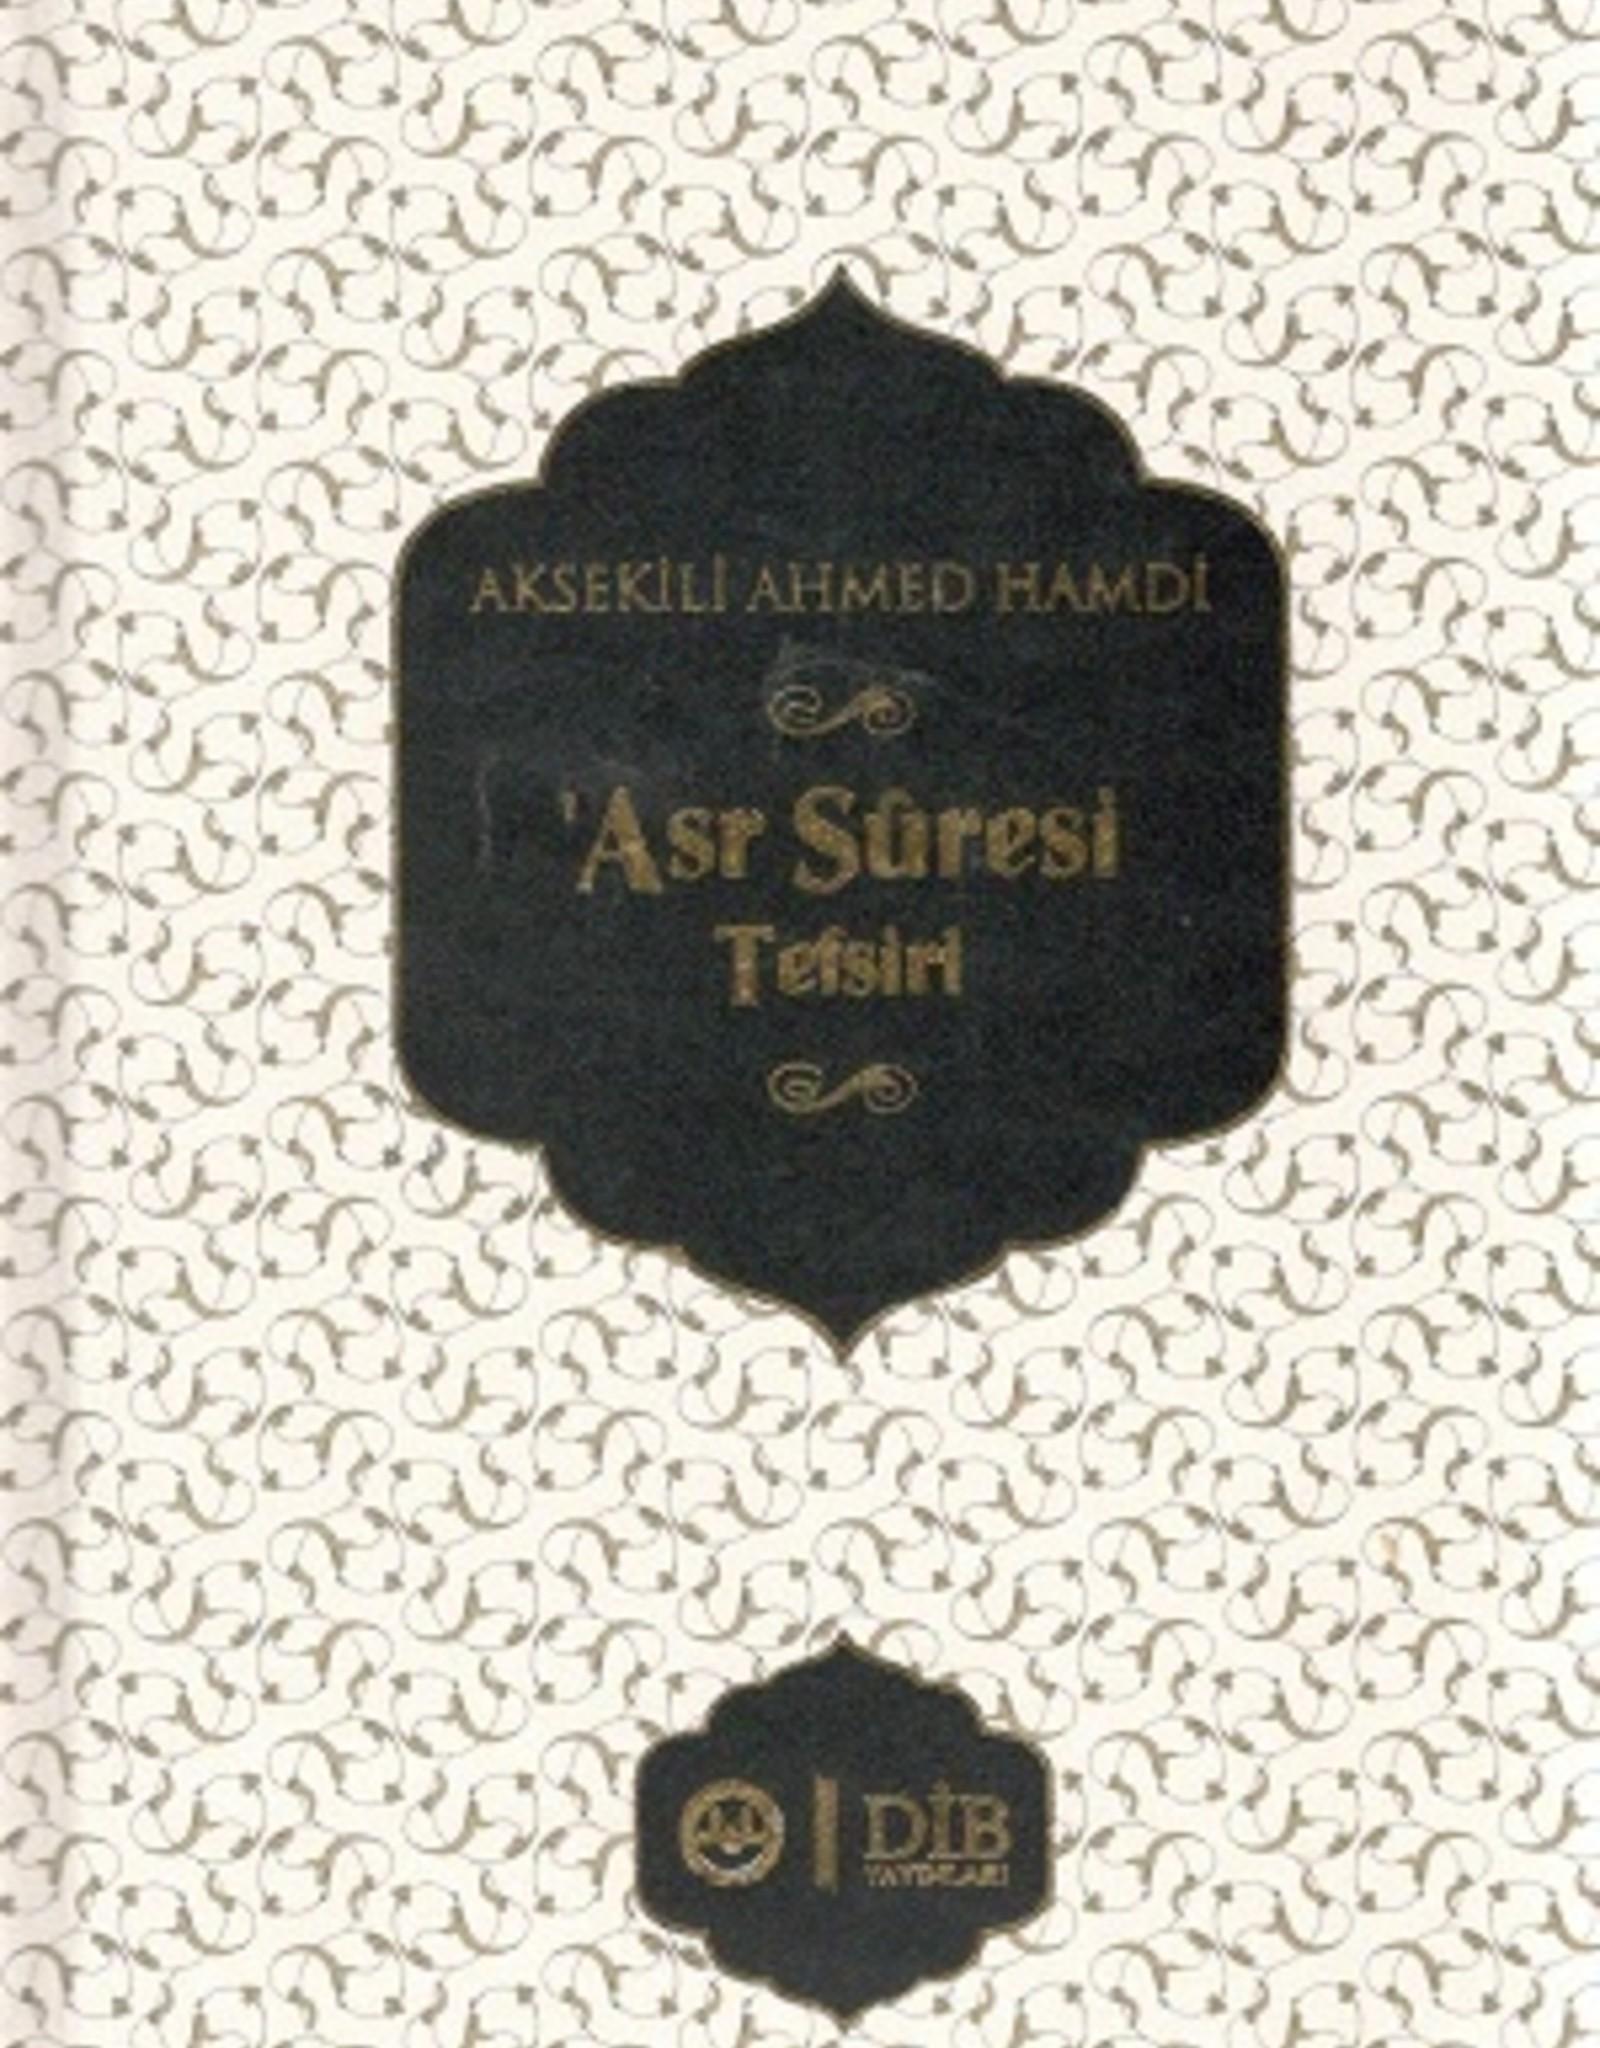 Aksekili Ahmed Hamdi Asr Sûresi Tefsiri